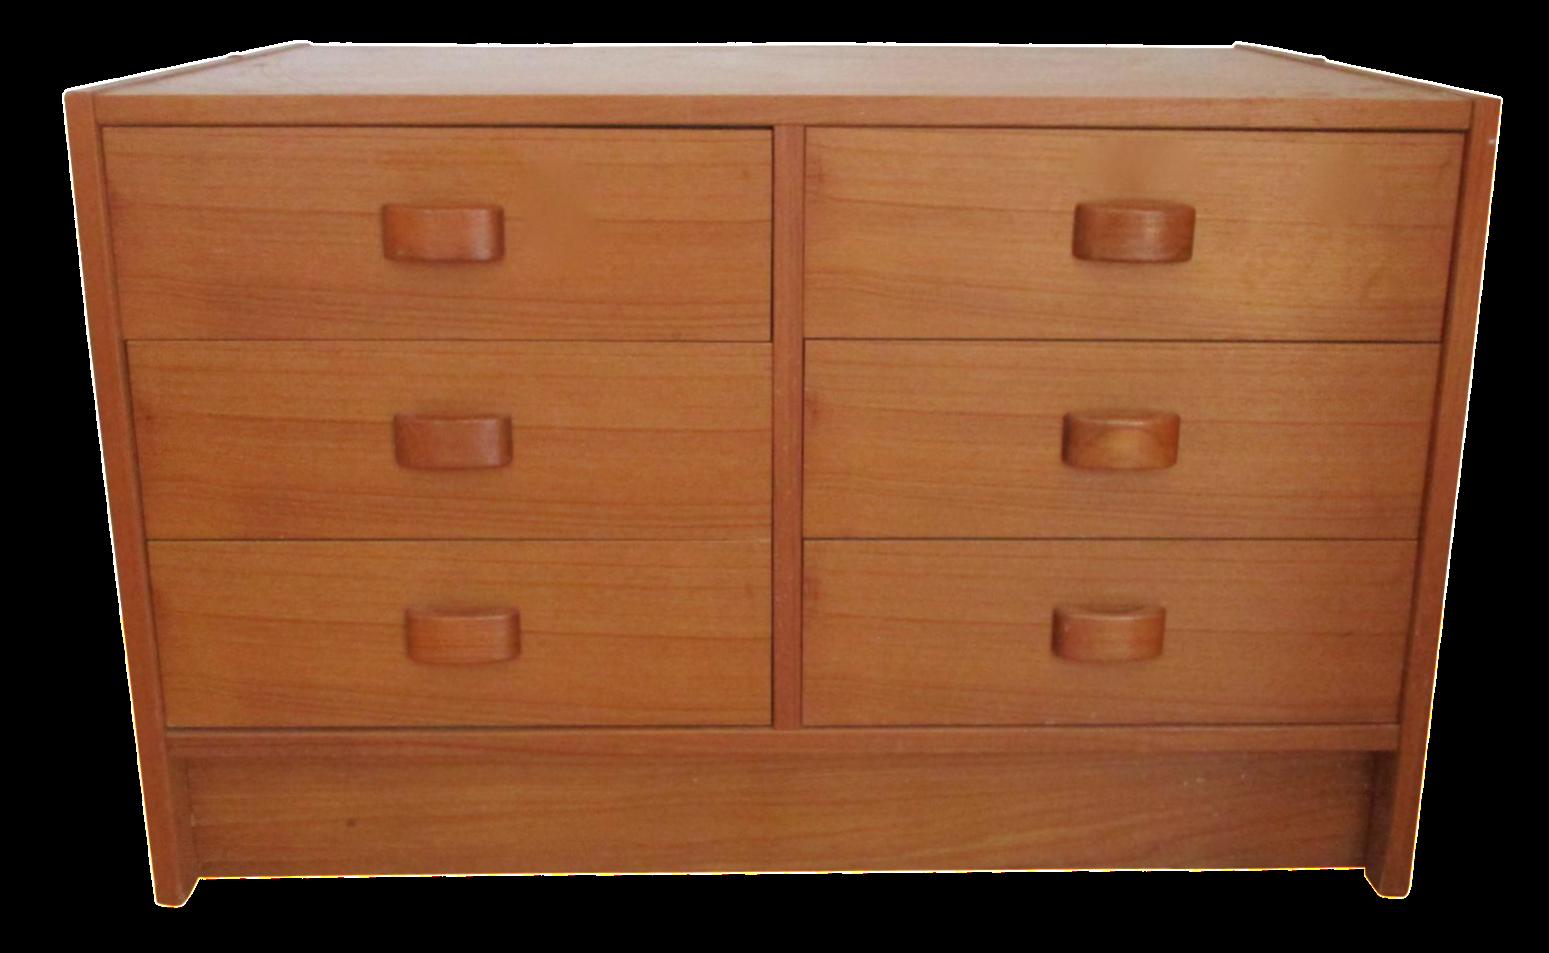 Mid Century Modern Danish Teak Domino Mobler Dresser Nightstand Small Cabinet Jewelry